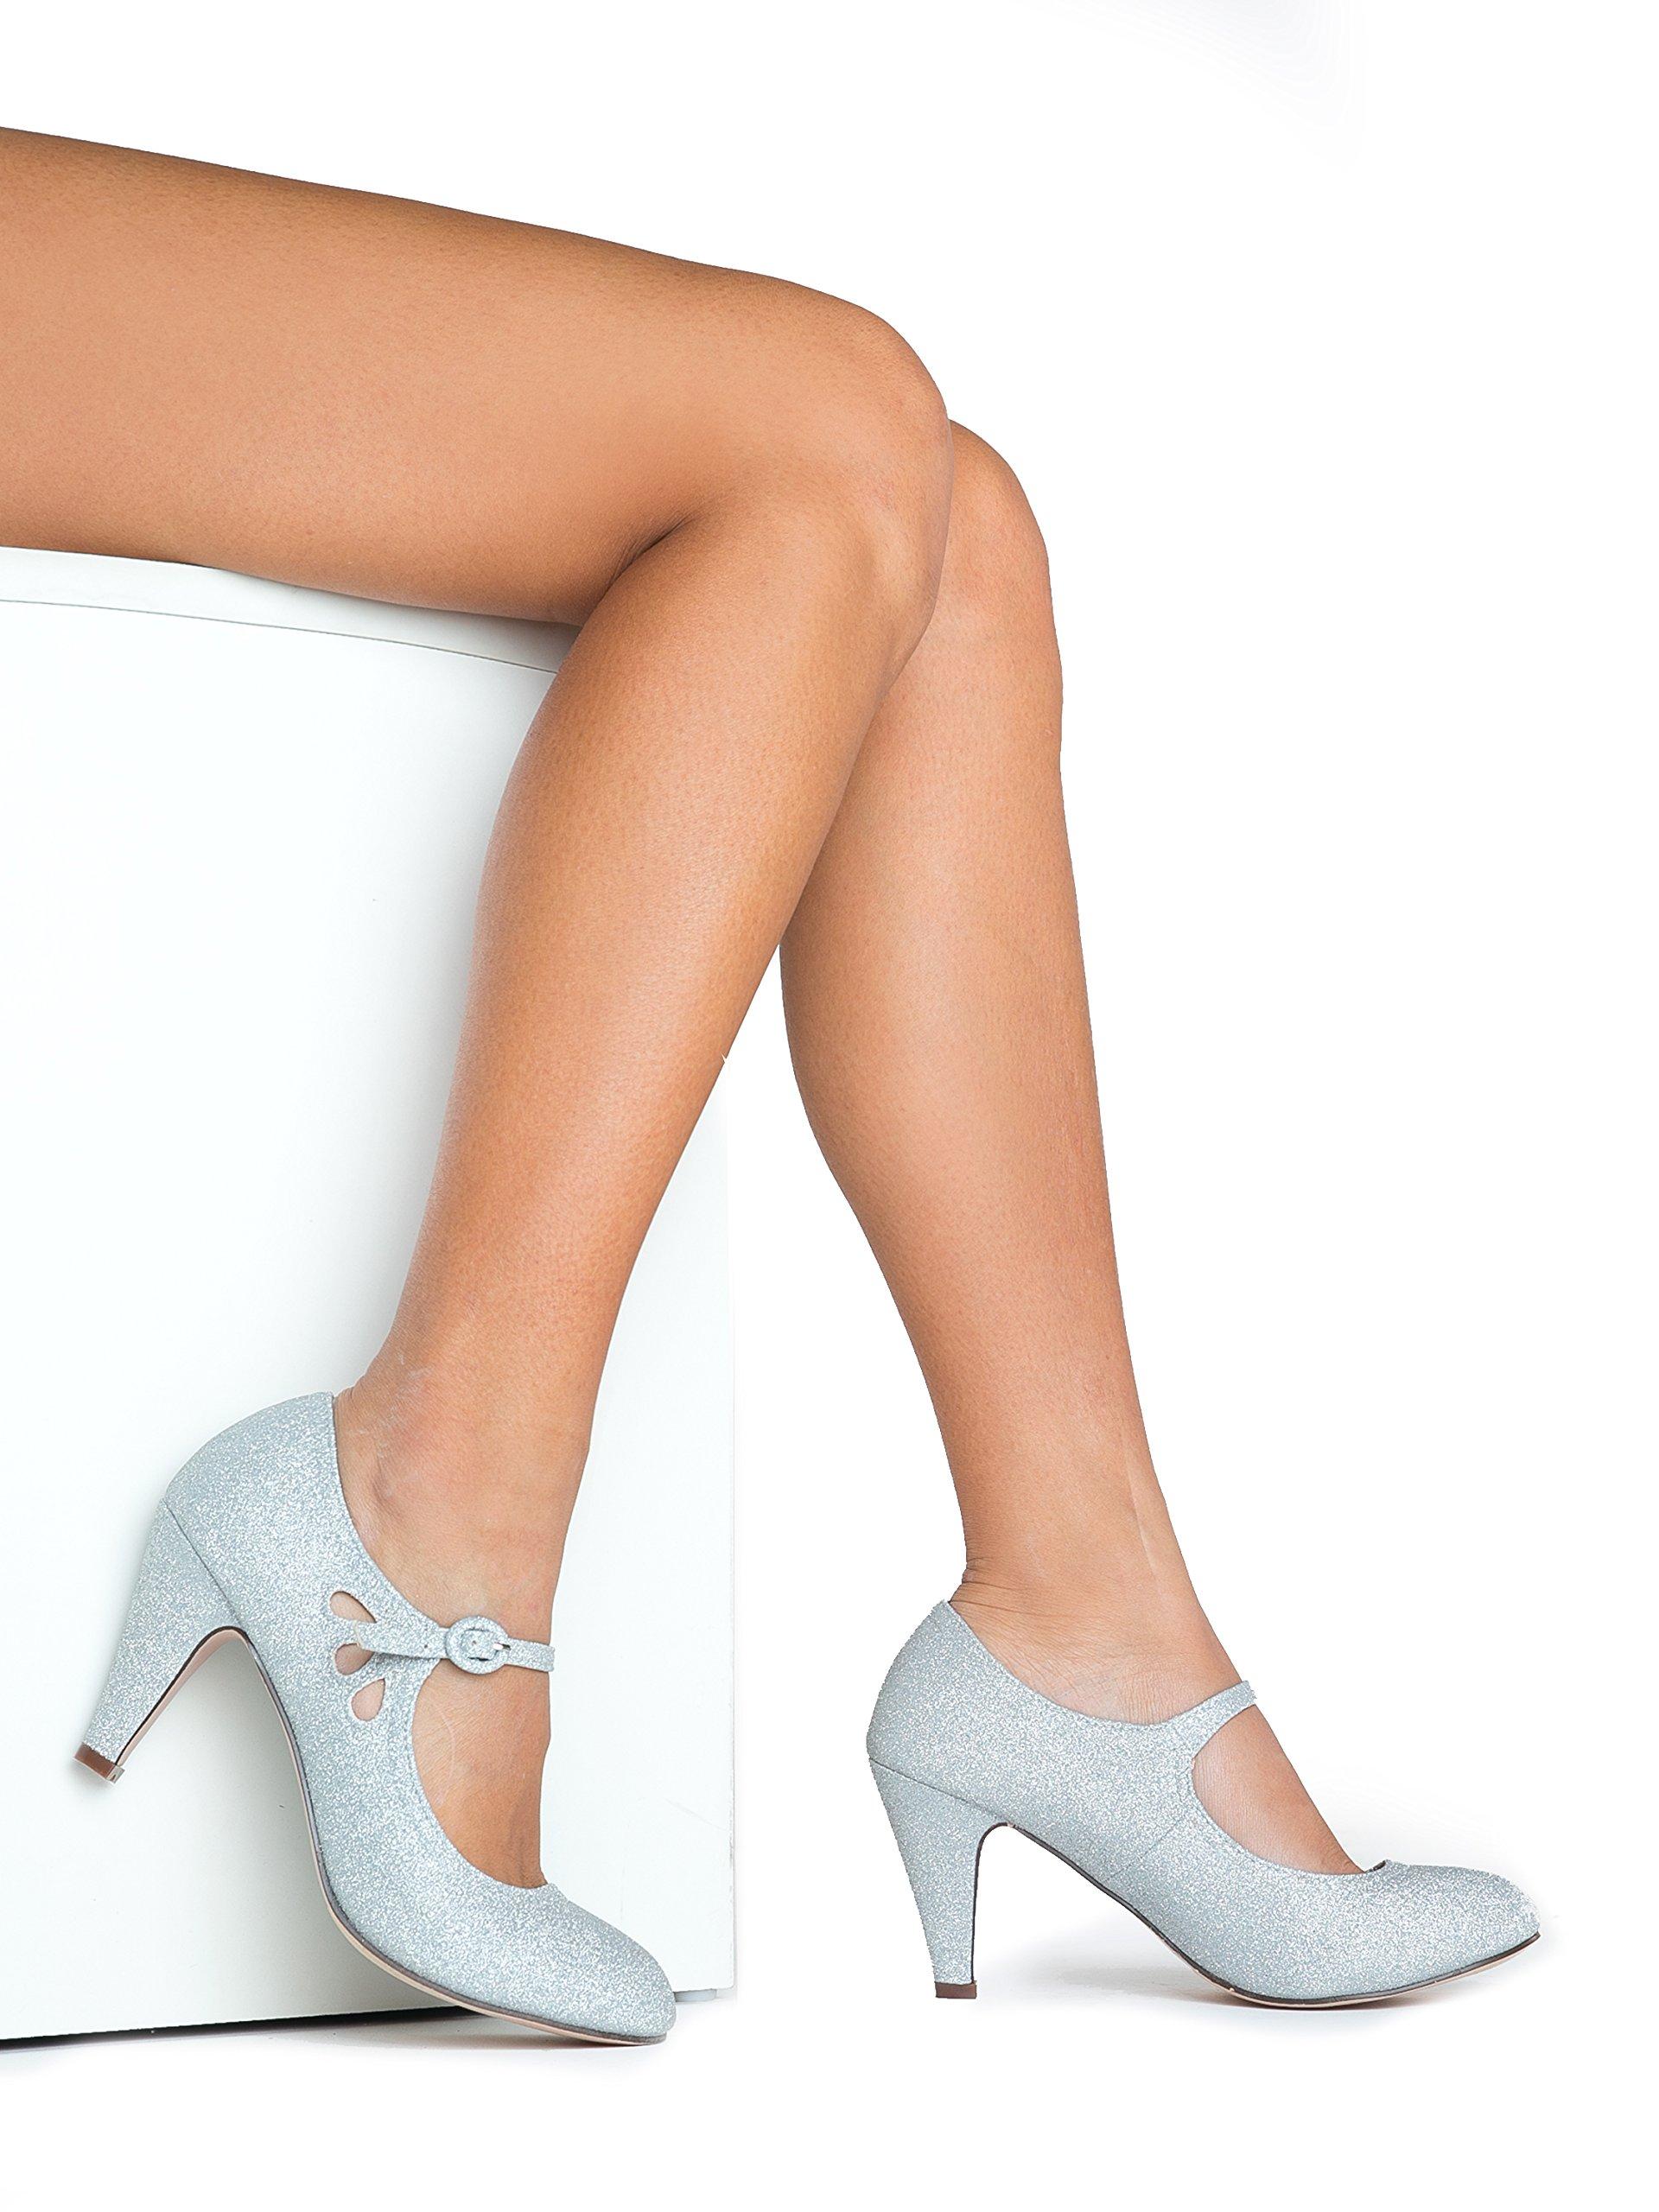 Pixie Mary Jane Heel, Silver Glitter, 8 B(M) US by ZooShoo (Image #6)